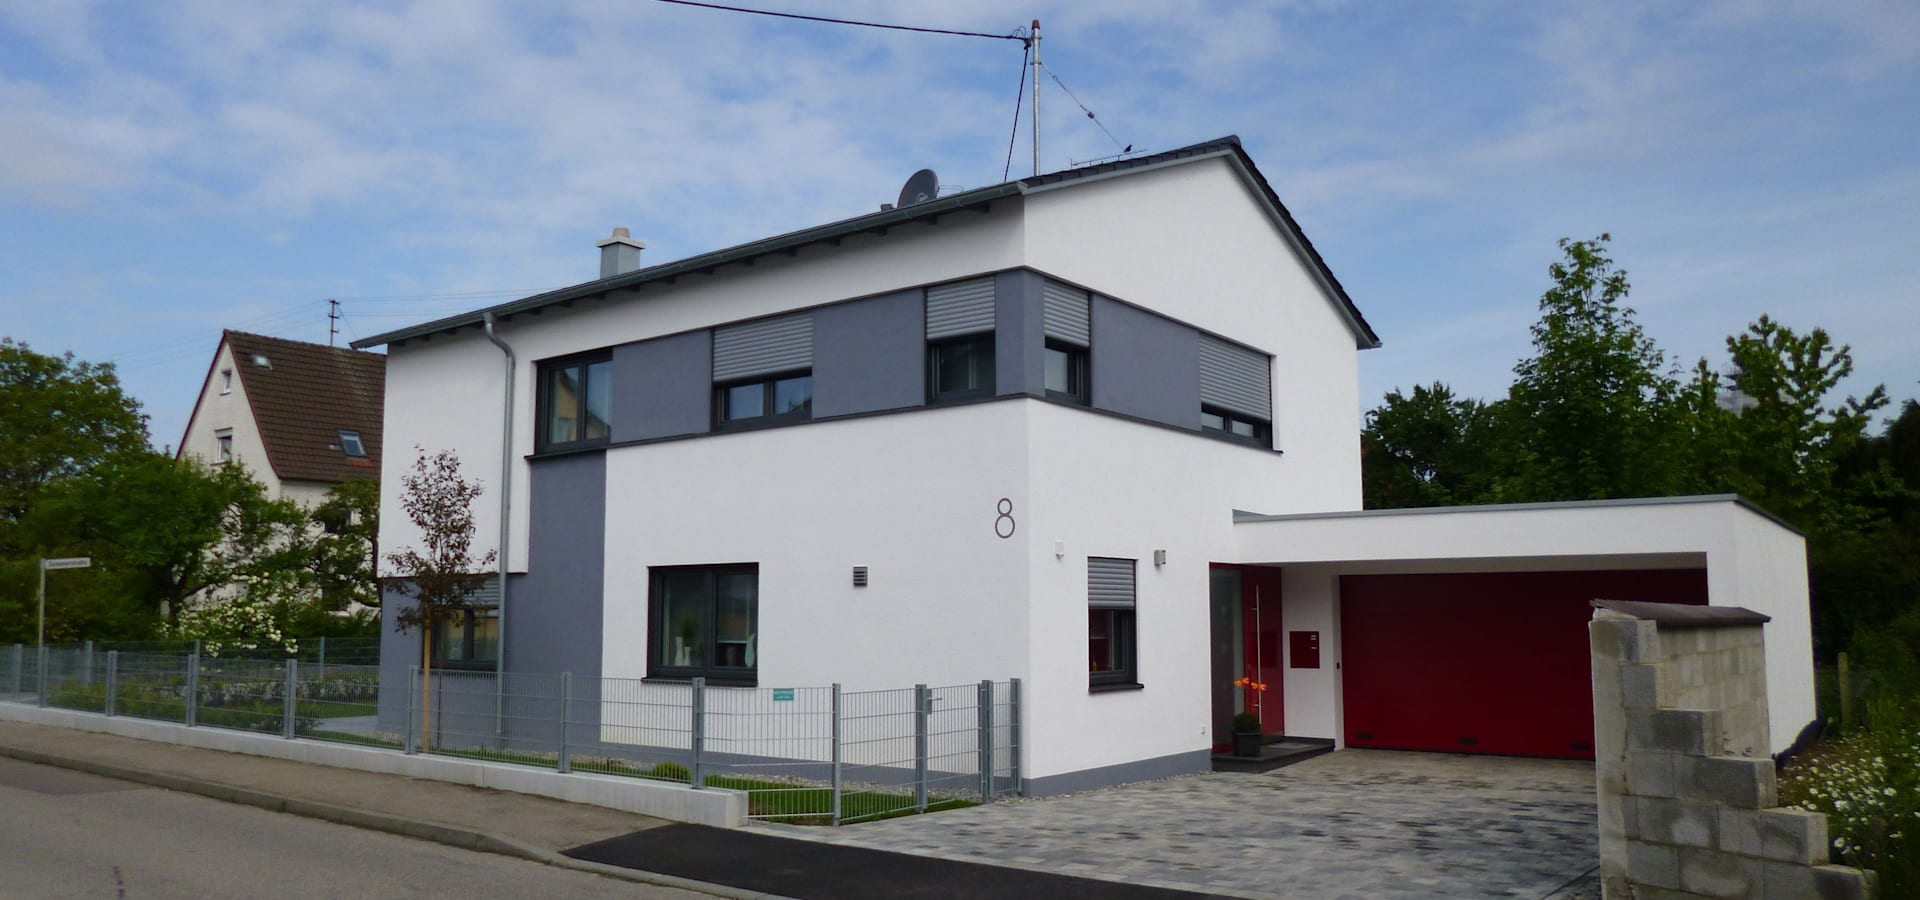 Architekturbüro Beier